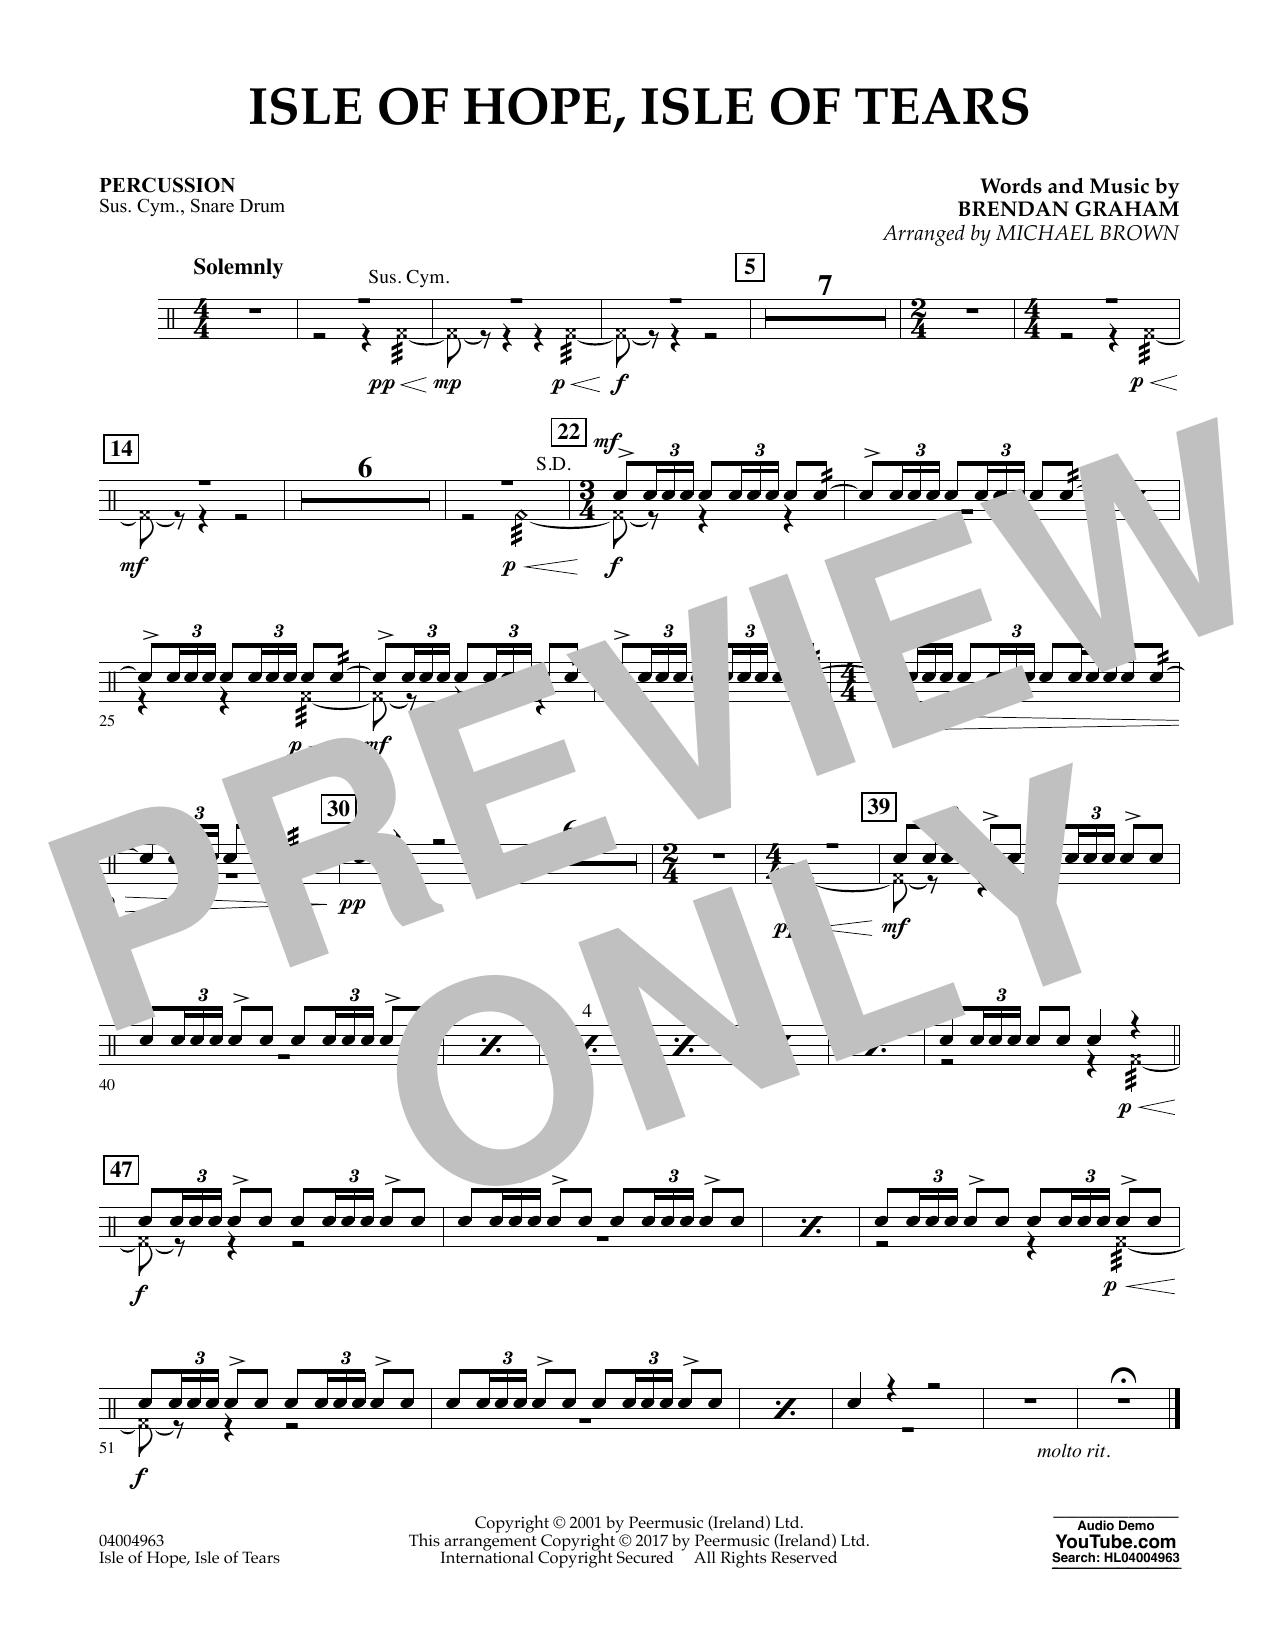 Isle of Hope, Isle of Tears - Percussion Sheet Music